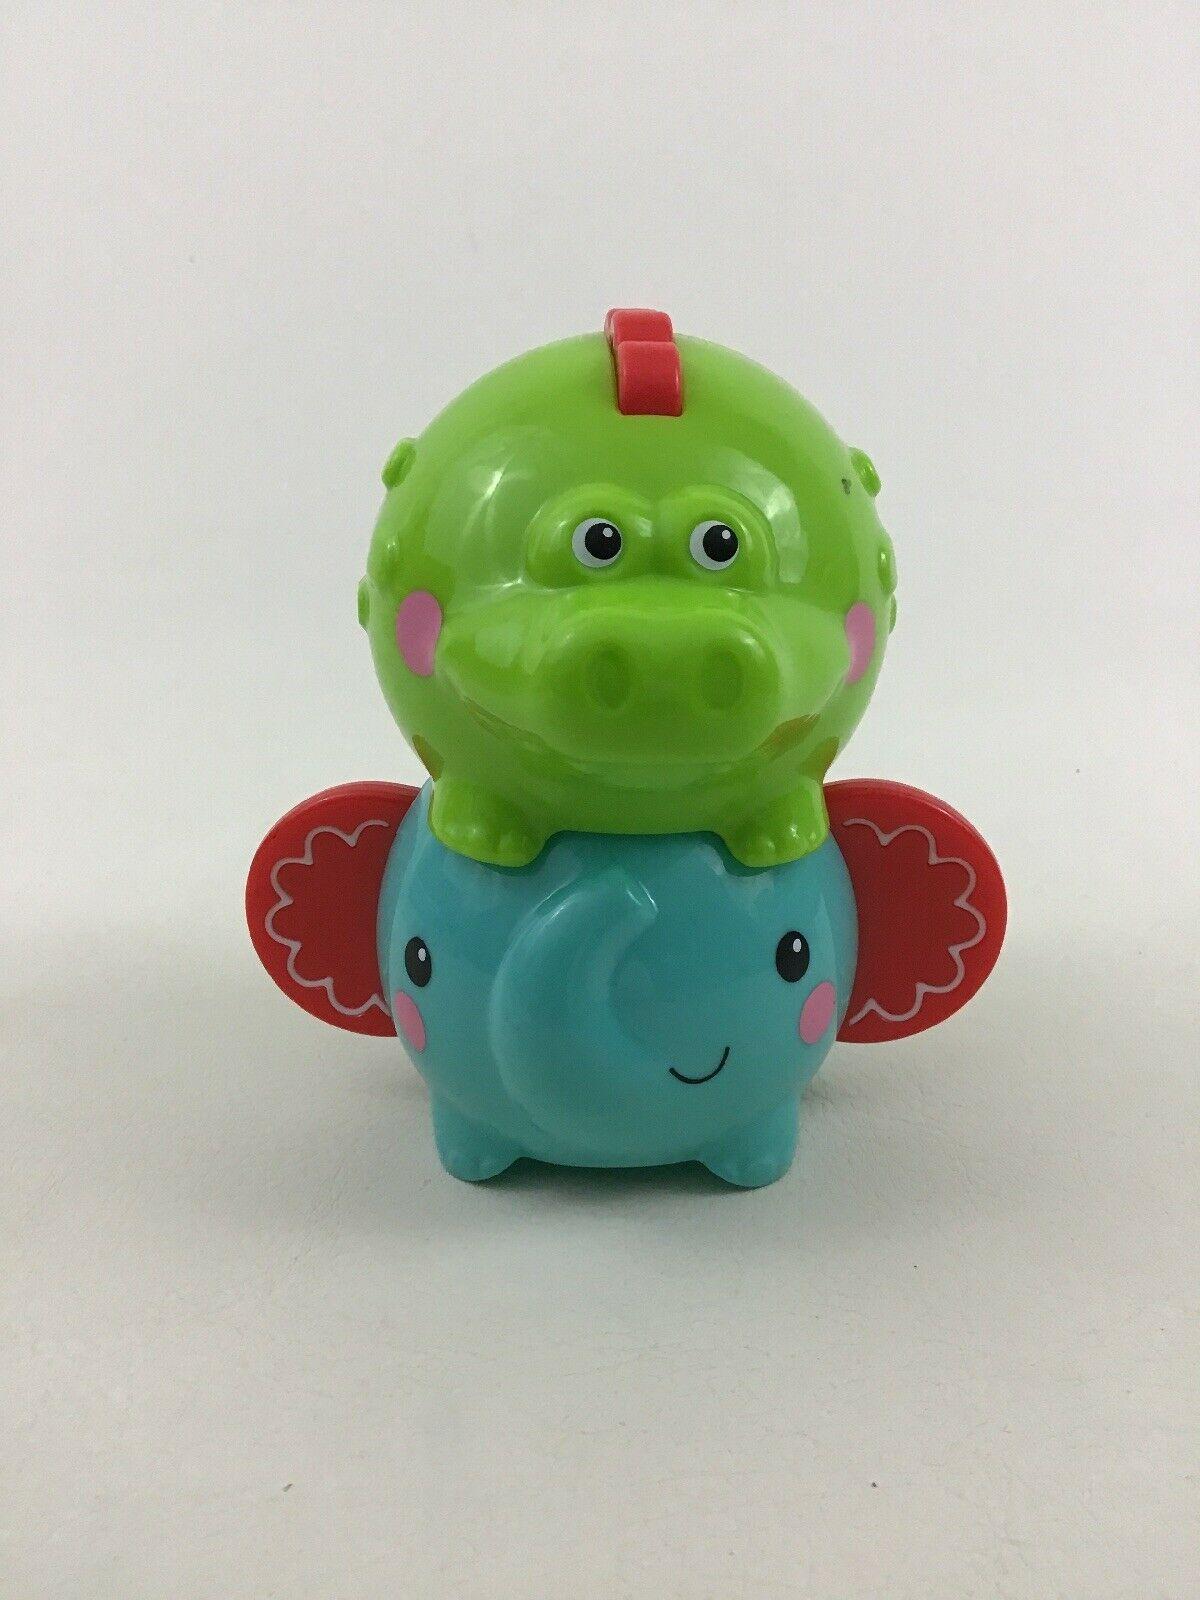 Fisher Price Toddler Stacking Animal Toys 3pc Lot Elephant Crocodile Toy image 6